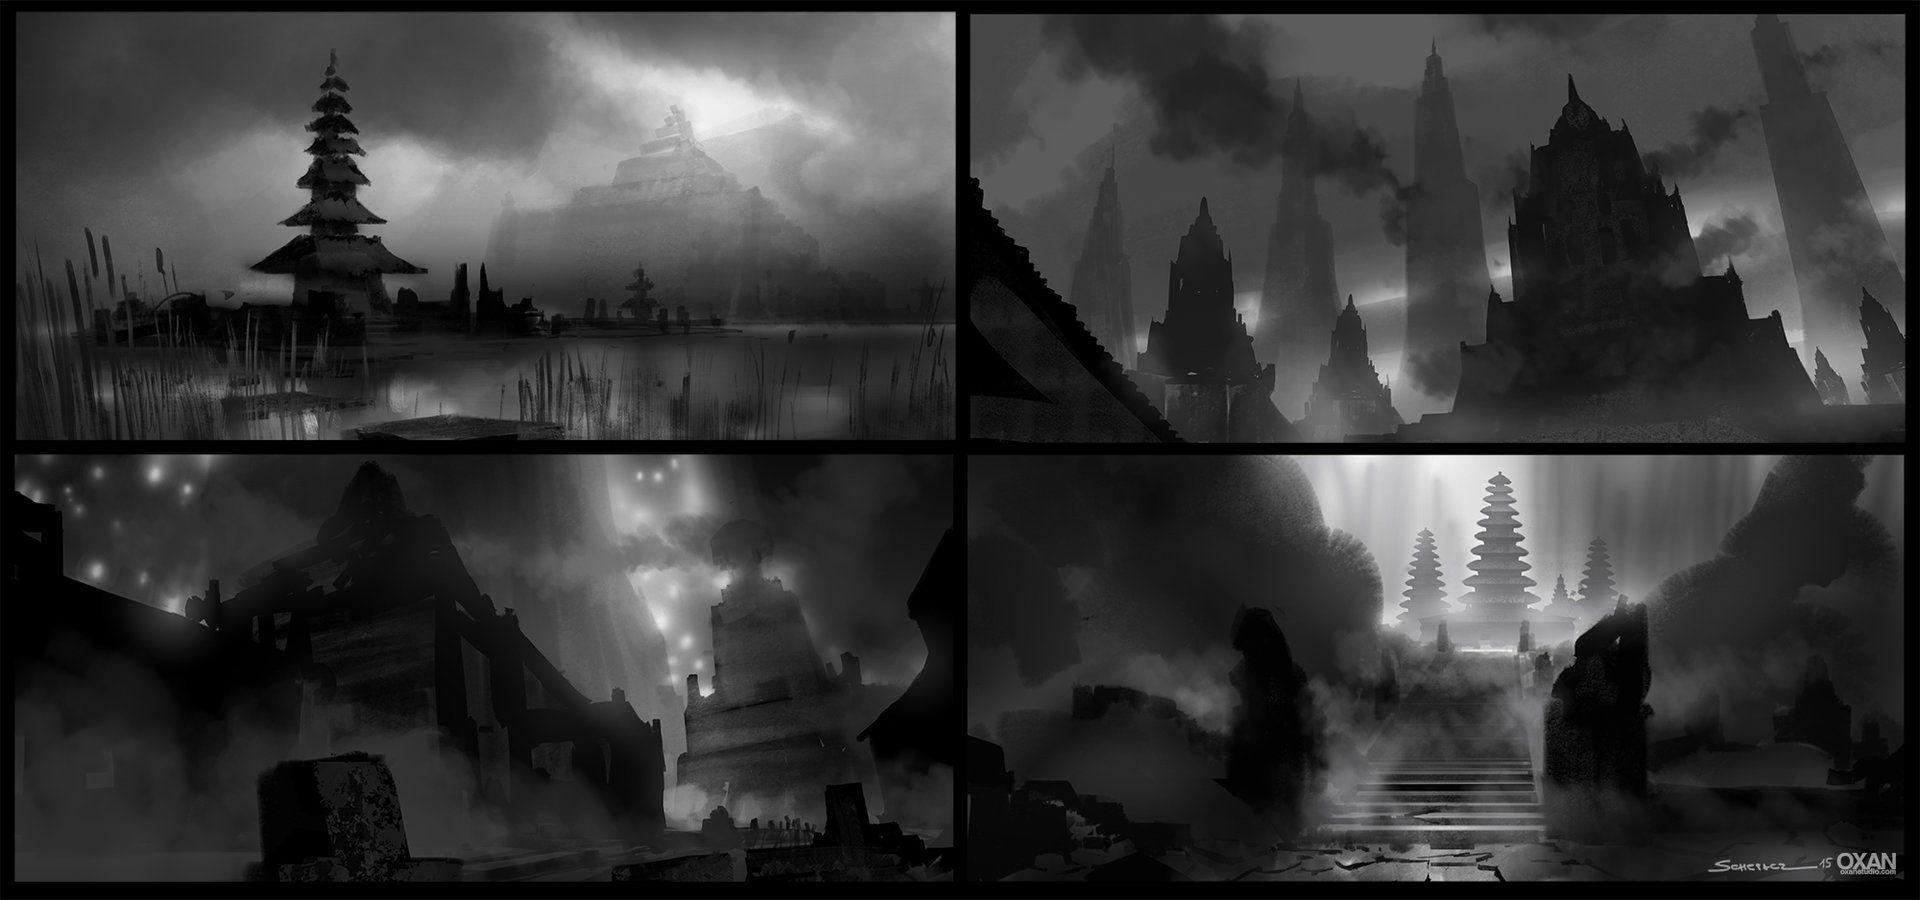 ArtStation - Lost worlds - Environment Thumbnails , Yohann Schepacz OXAN STUDIO